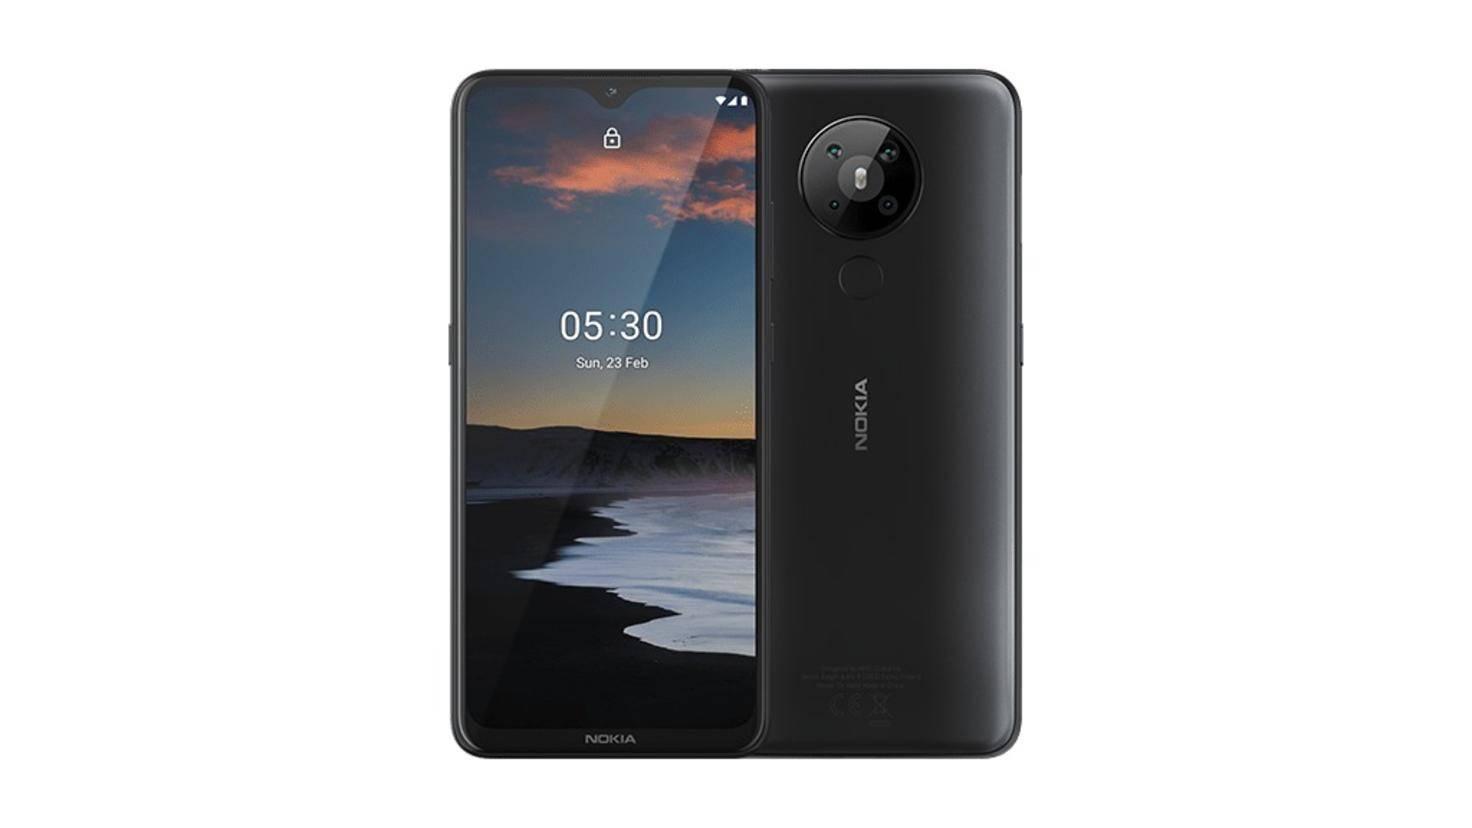 nokia-5.3-smartphone